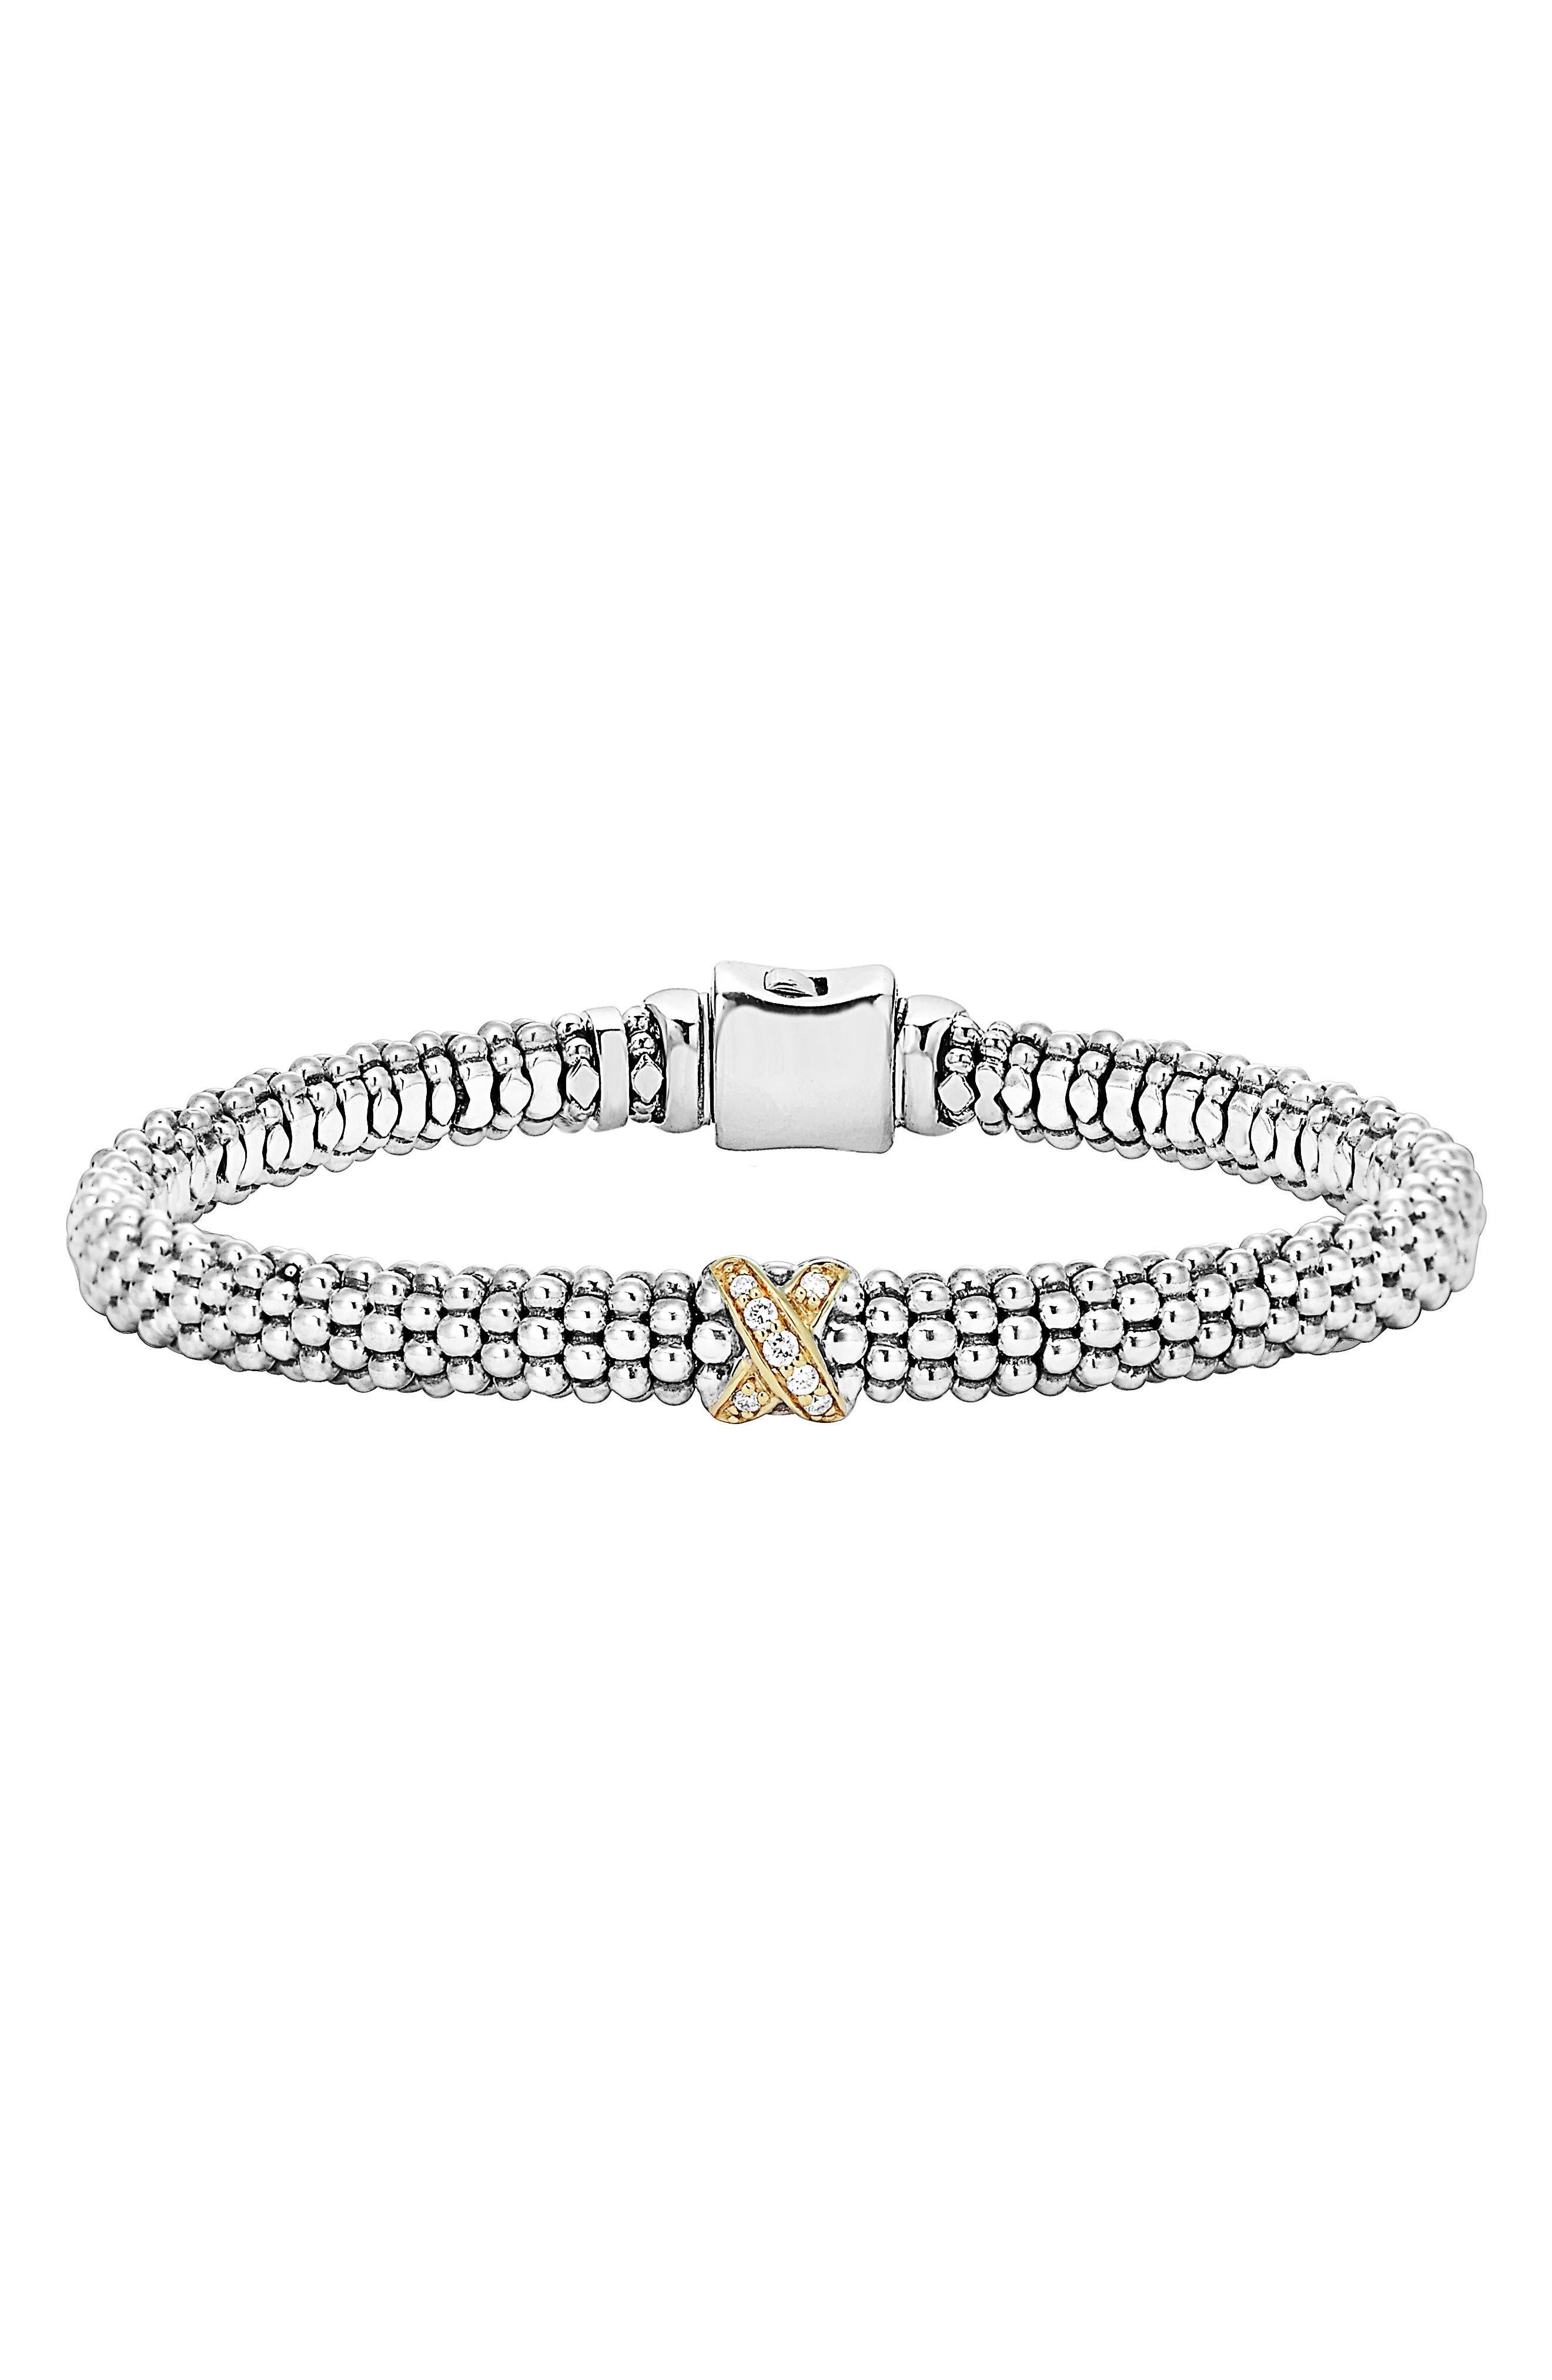 Caviar 'Signature Caviar' Diamond Rope Bracelet,                         Main,                         color, Sterling Silver/ Gold